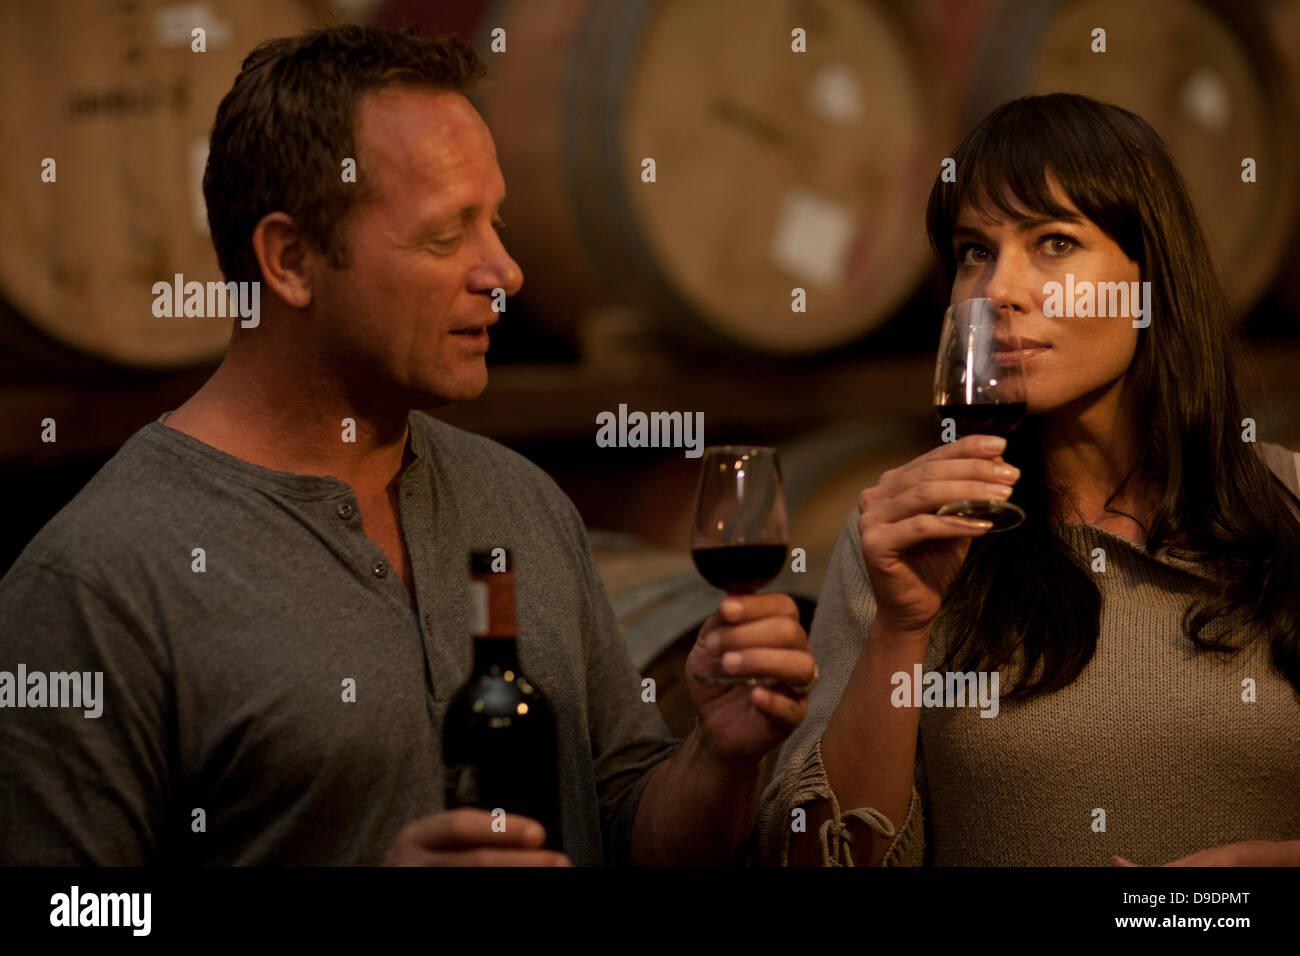 Sampling wine in barrels - Stock Image